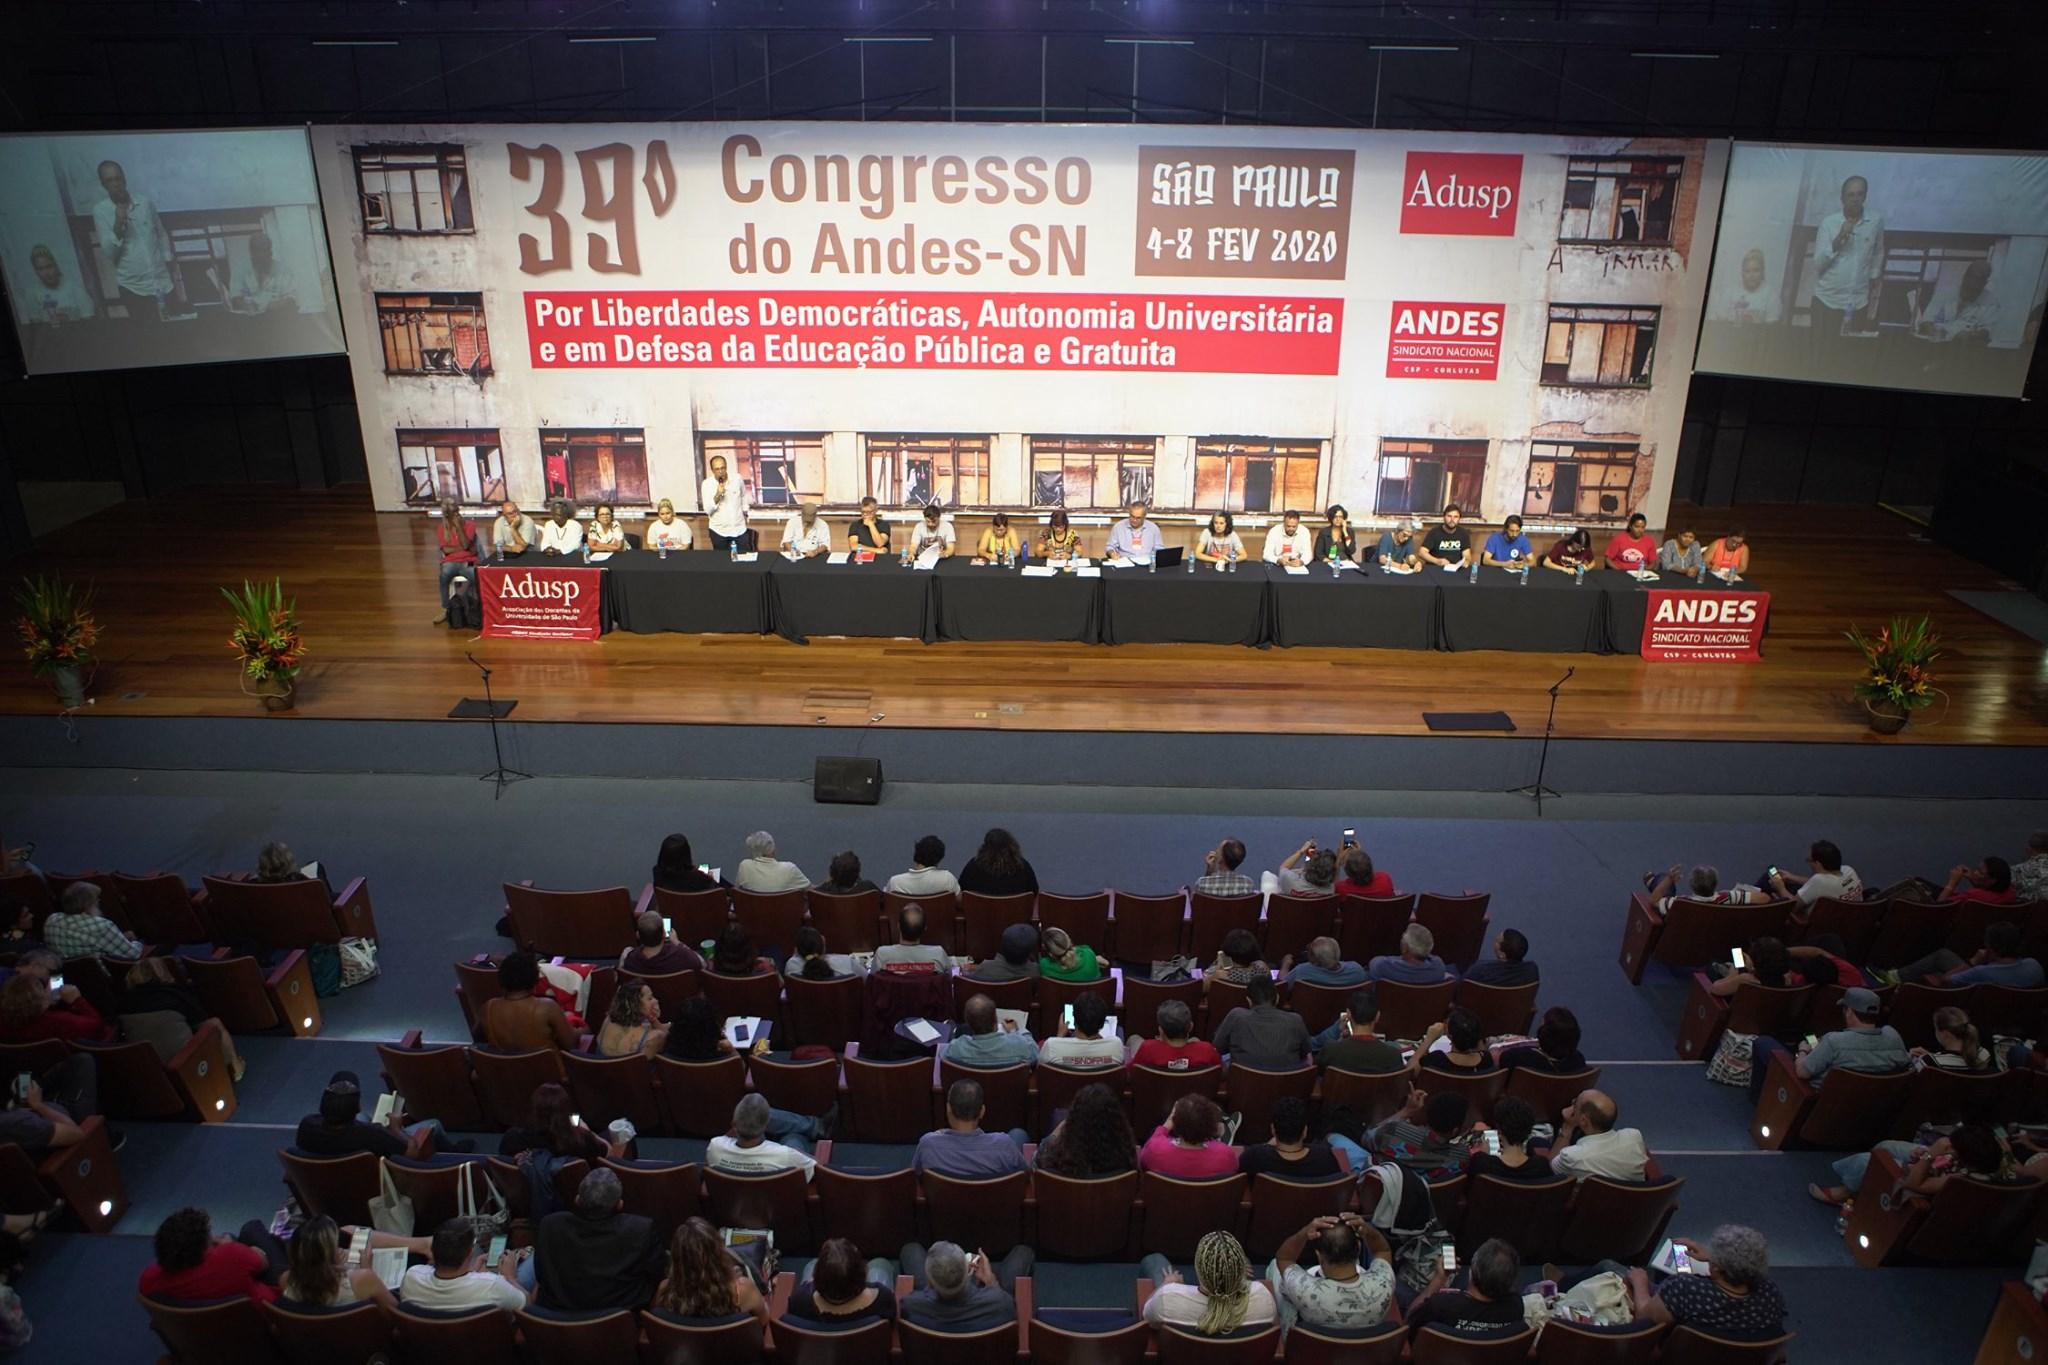 Adusb participa do 39º Congresso do Andes-SN, fortalecendo a democracia interna no sindicato